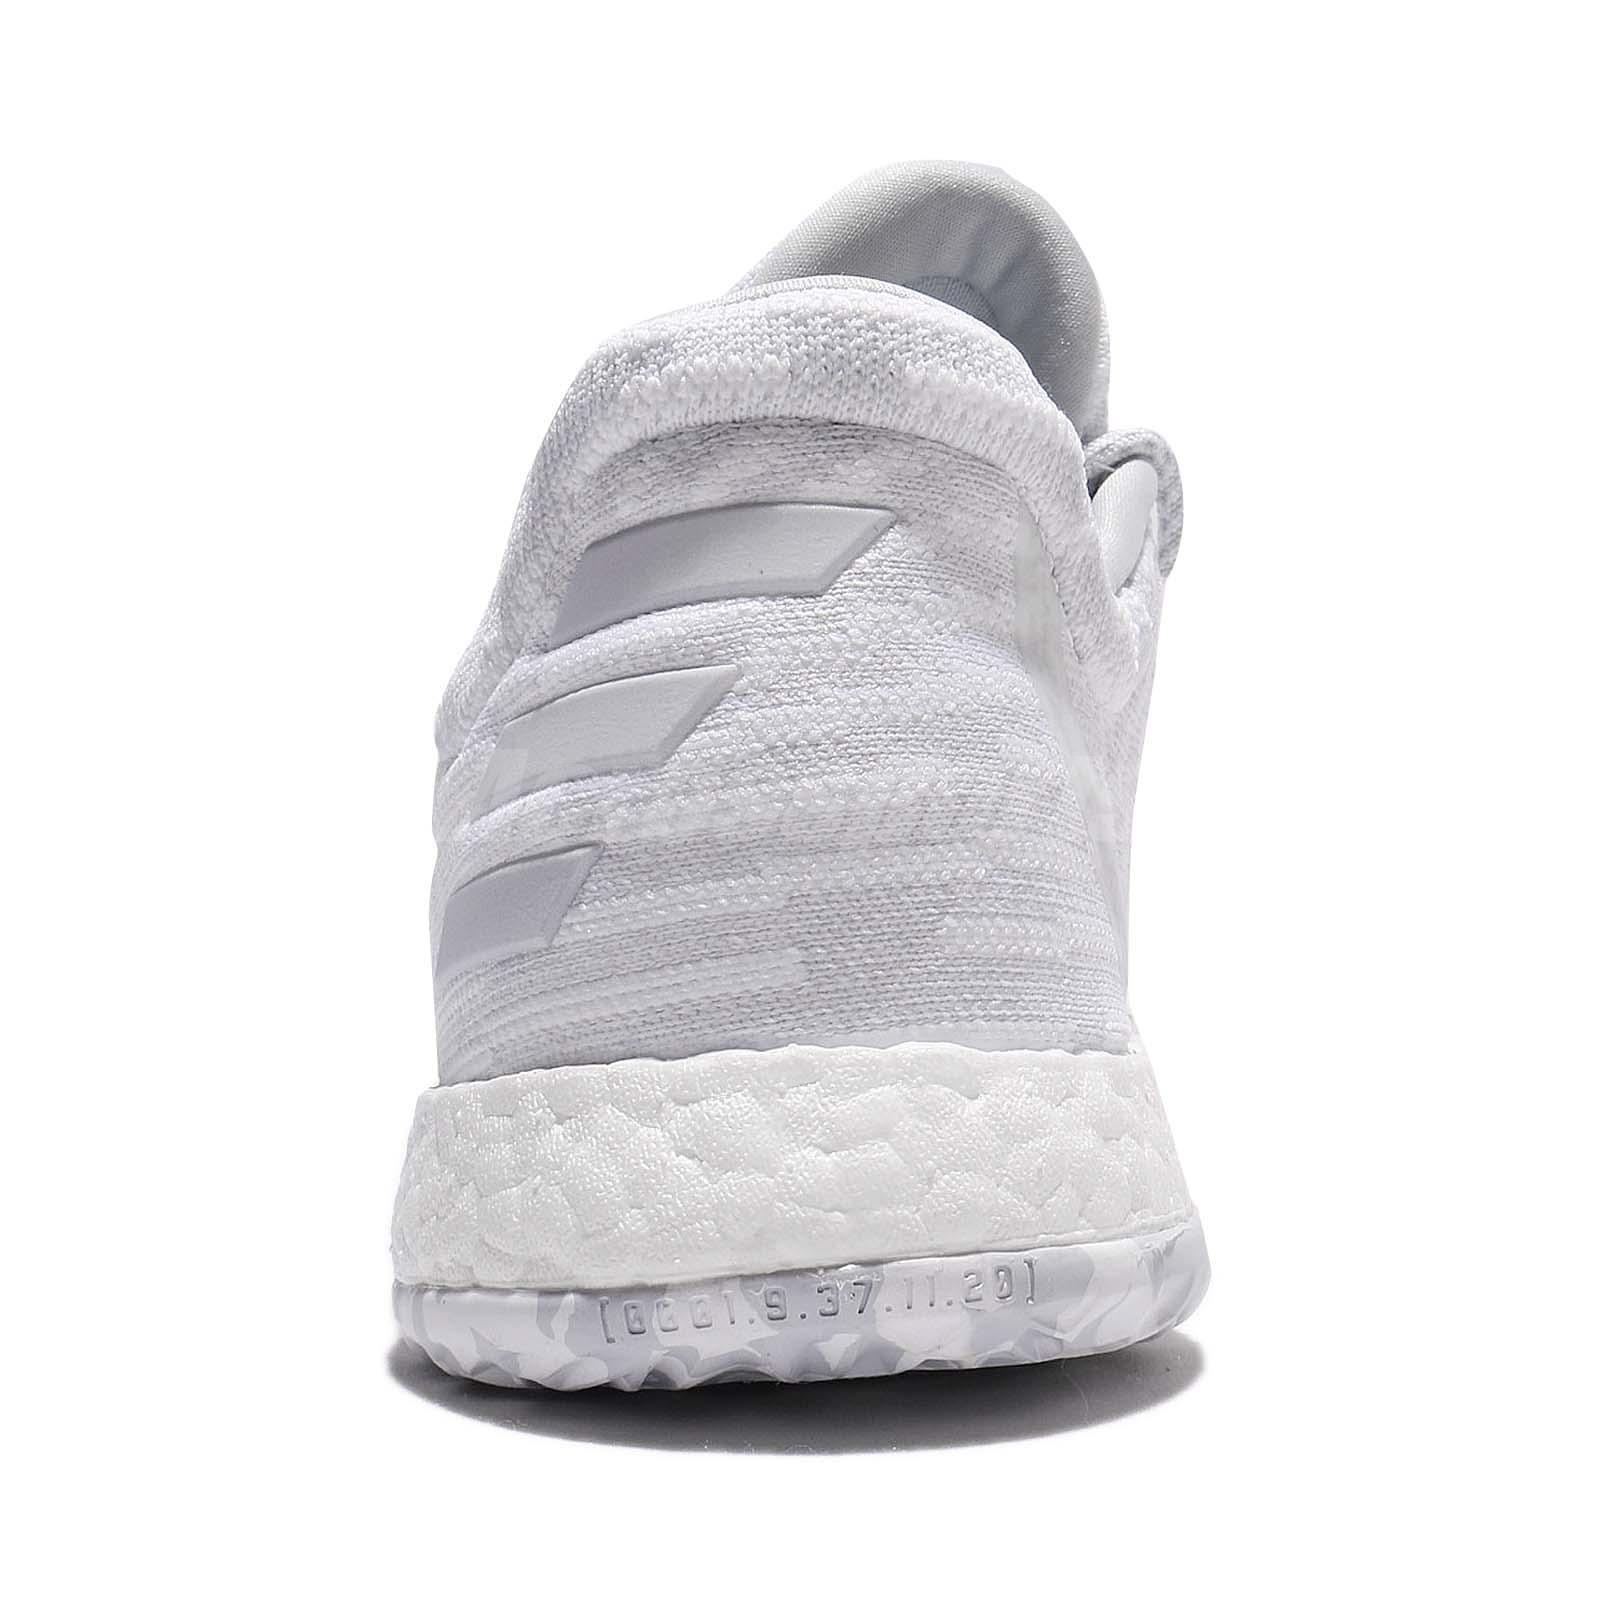 Adidas James Harden Vol 1 Ls qM1WDtx4I